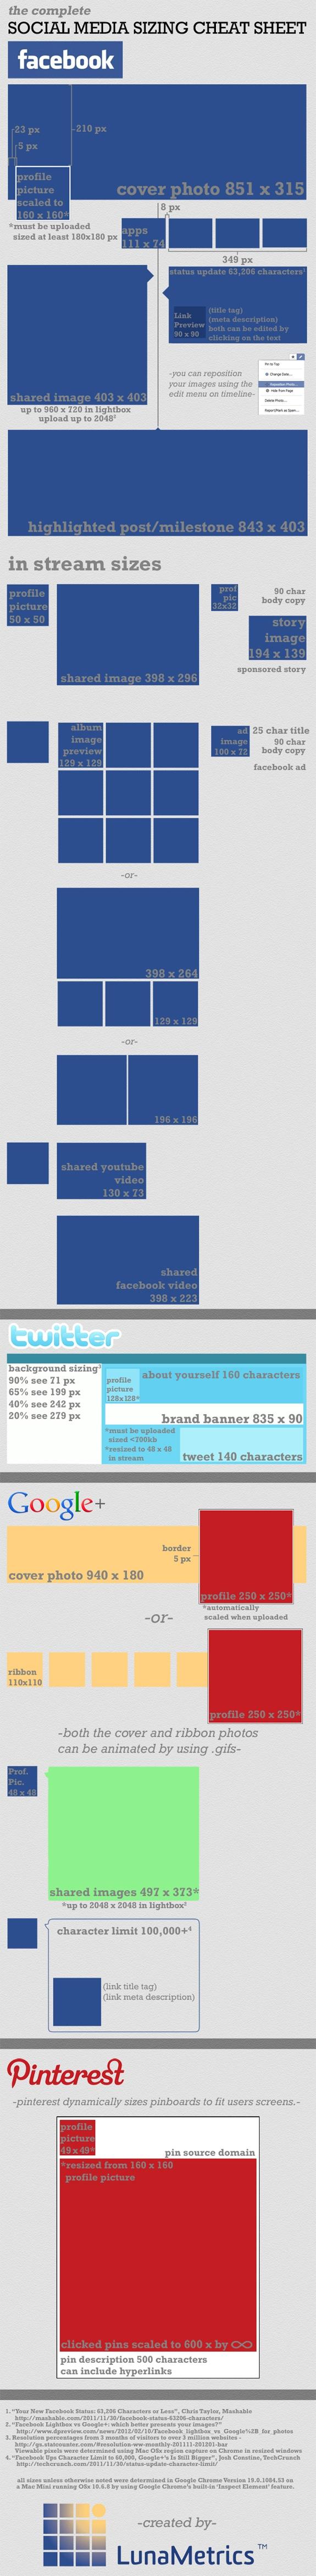 Social-Media-Image-Sizing